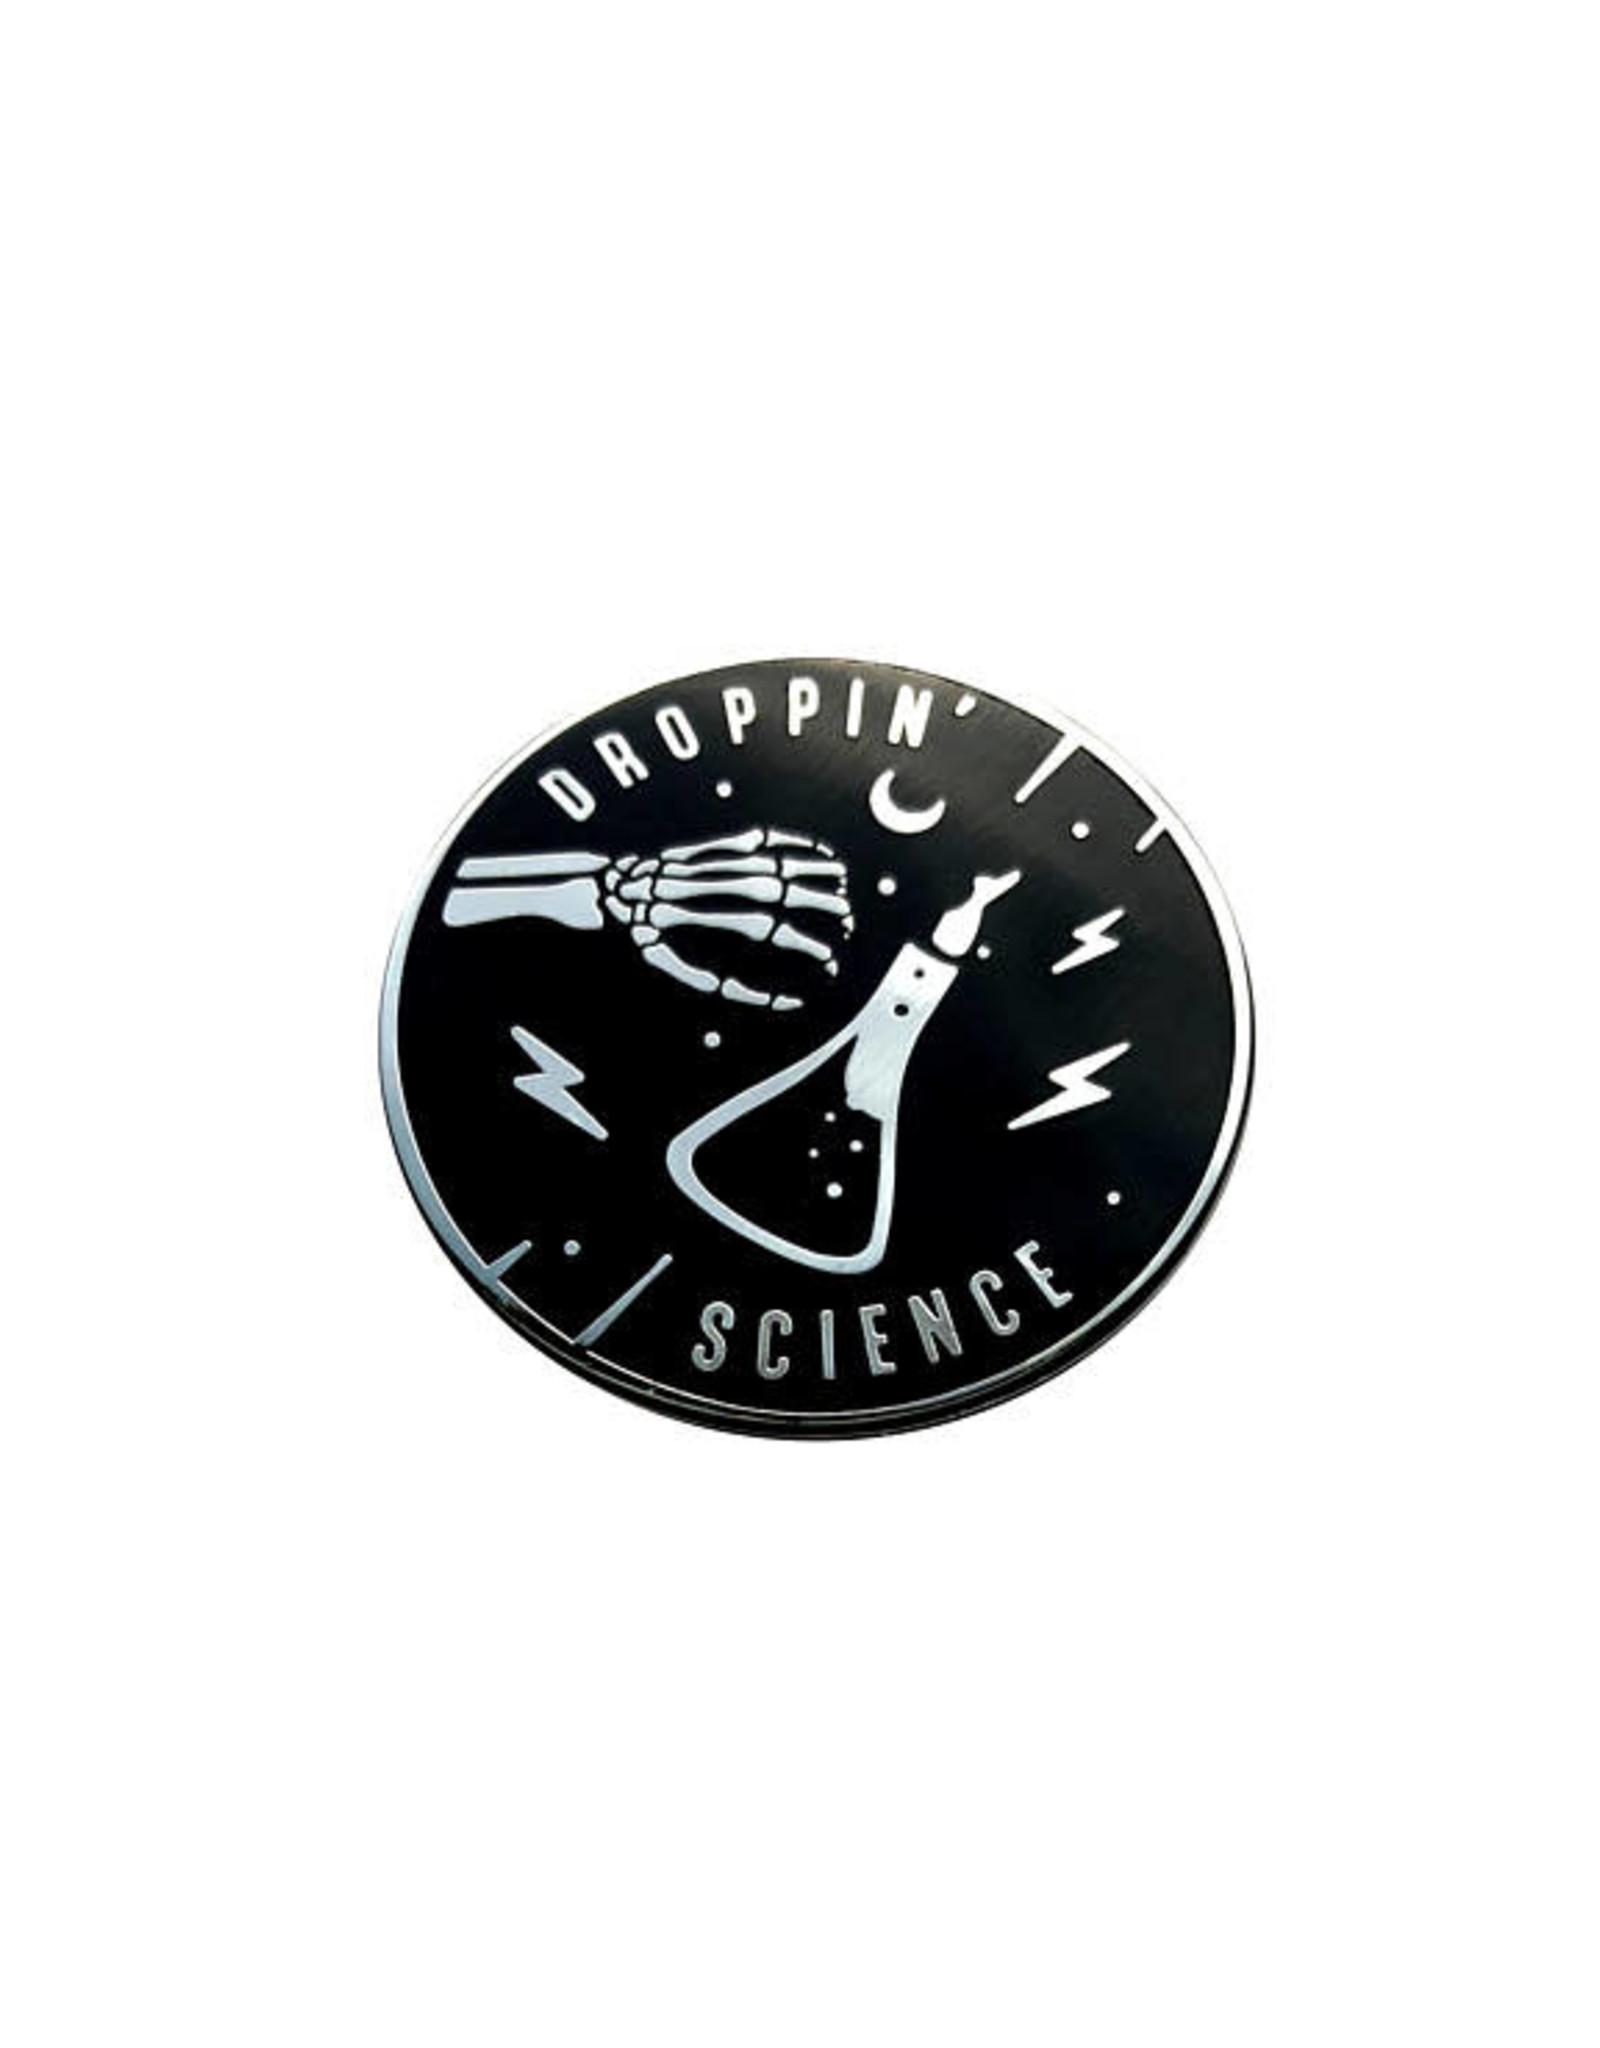 Enamel Pin Droppin' Science Enamel Pin